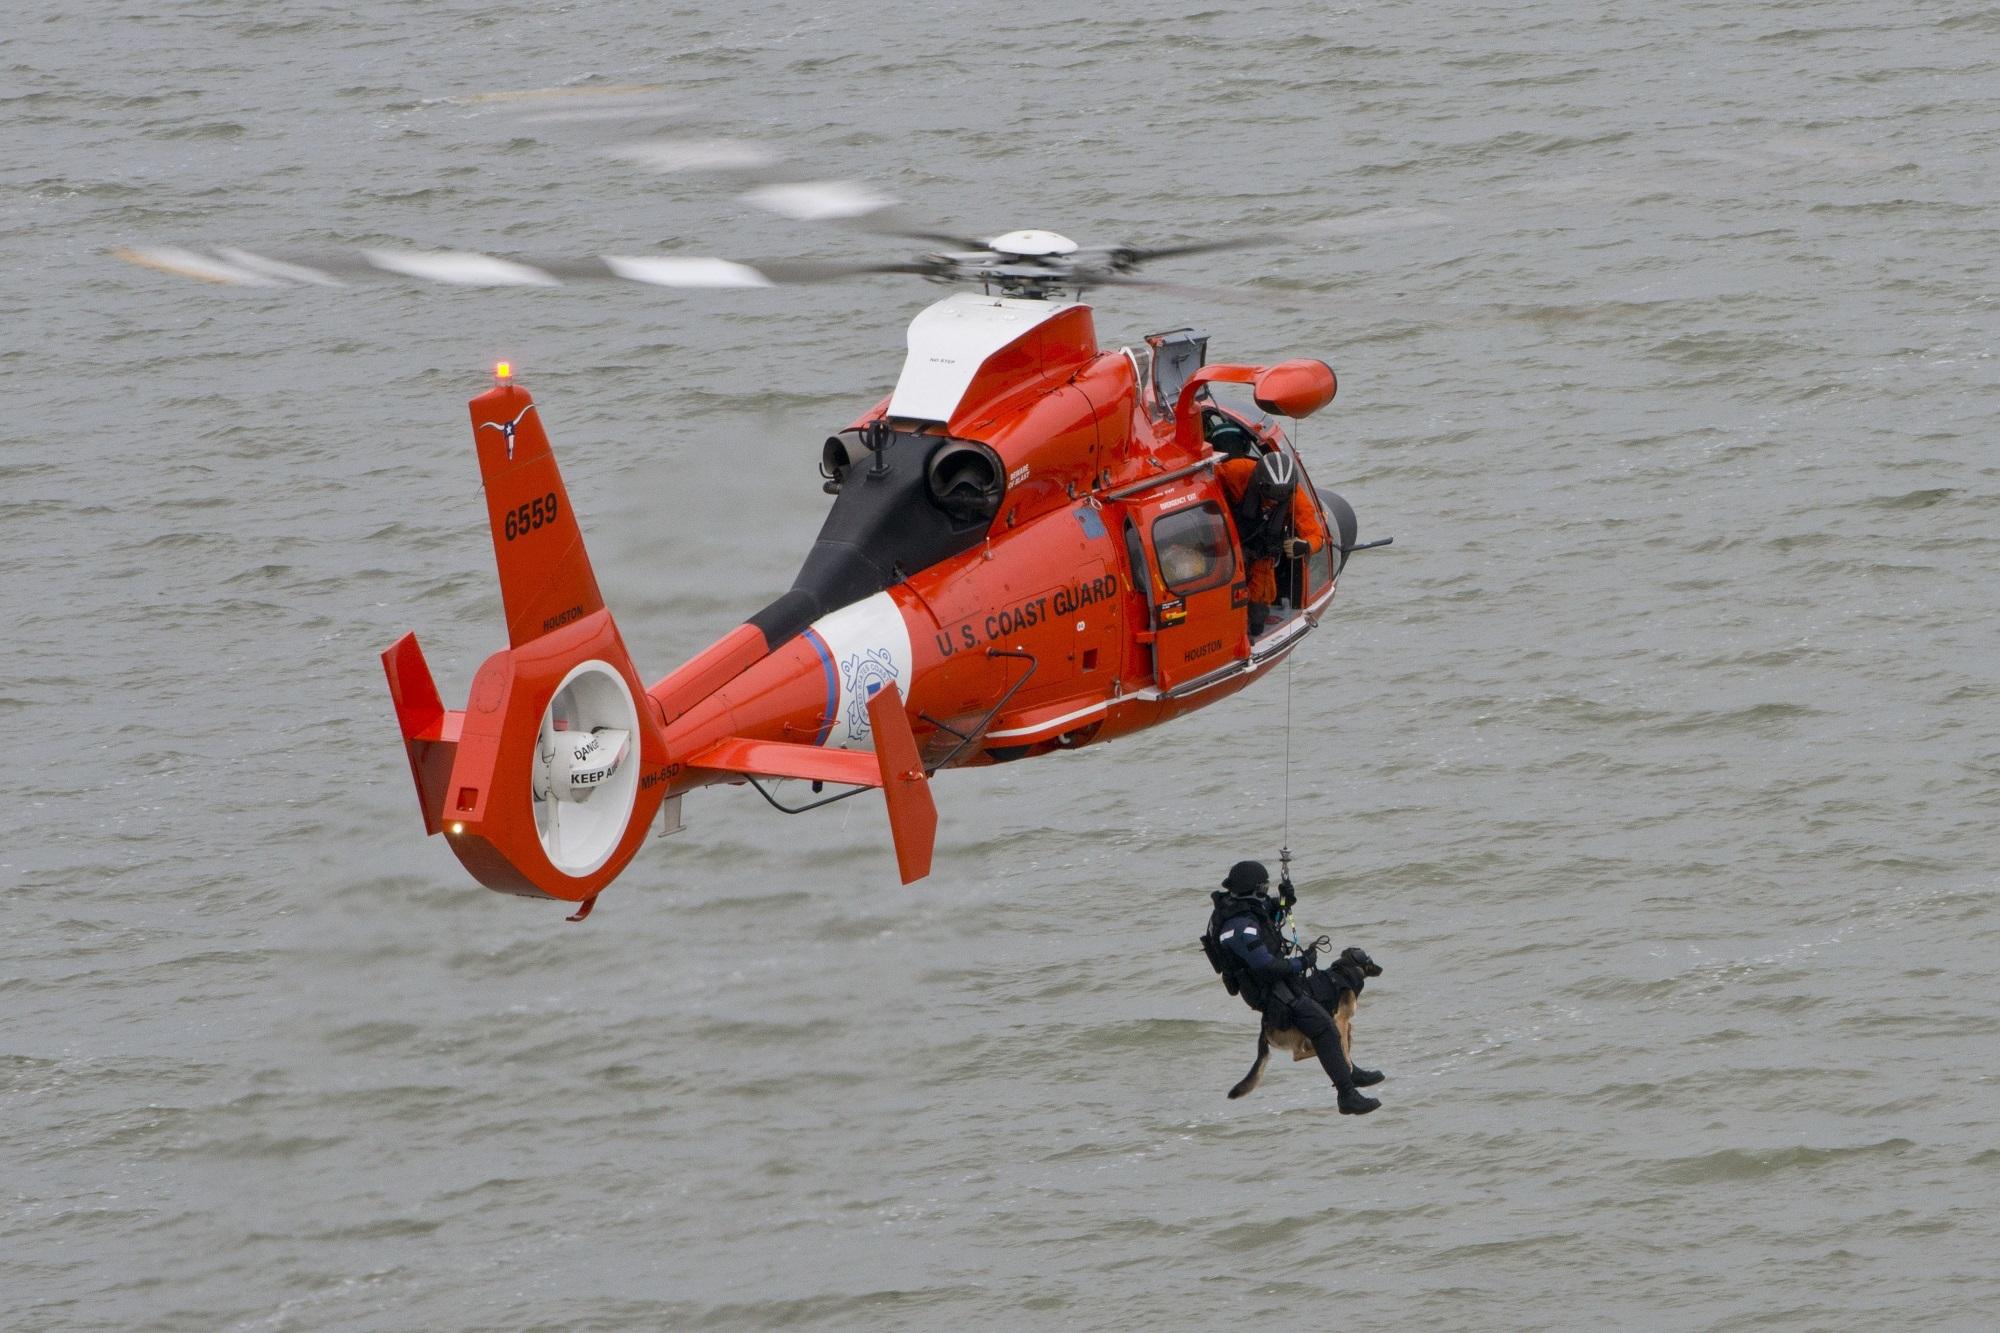 coast guard mission